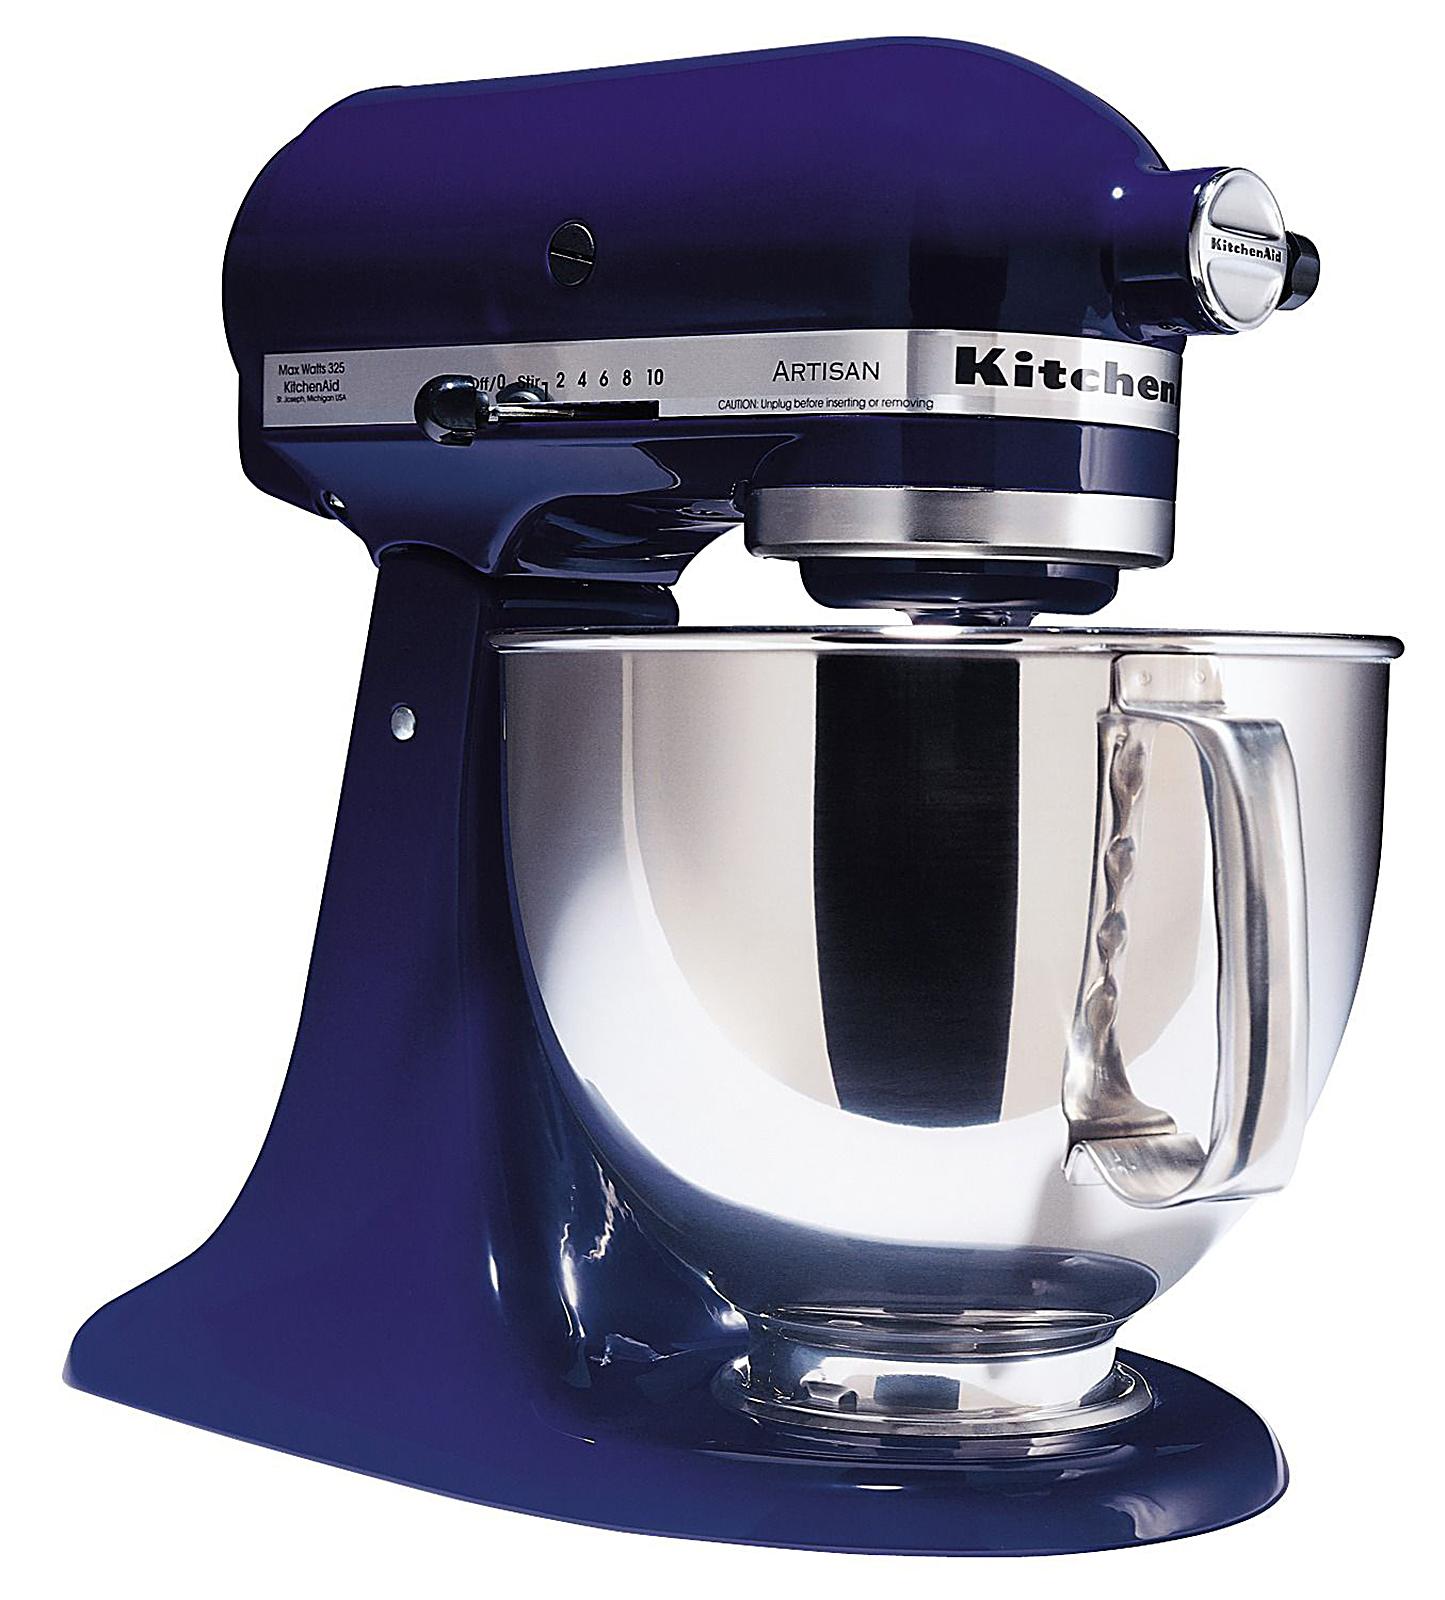 5 Artisan Kitchenaid Mixer Qt